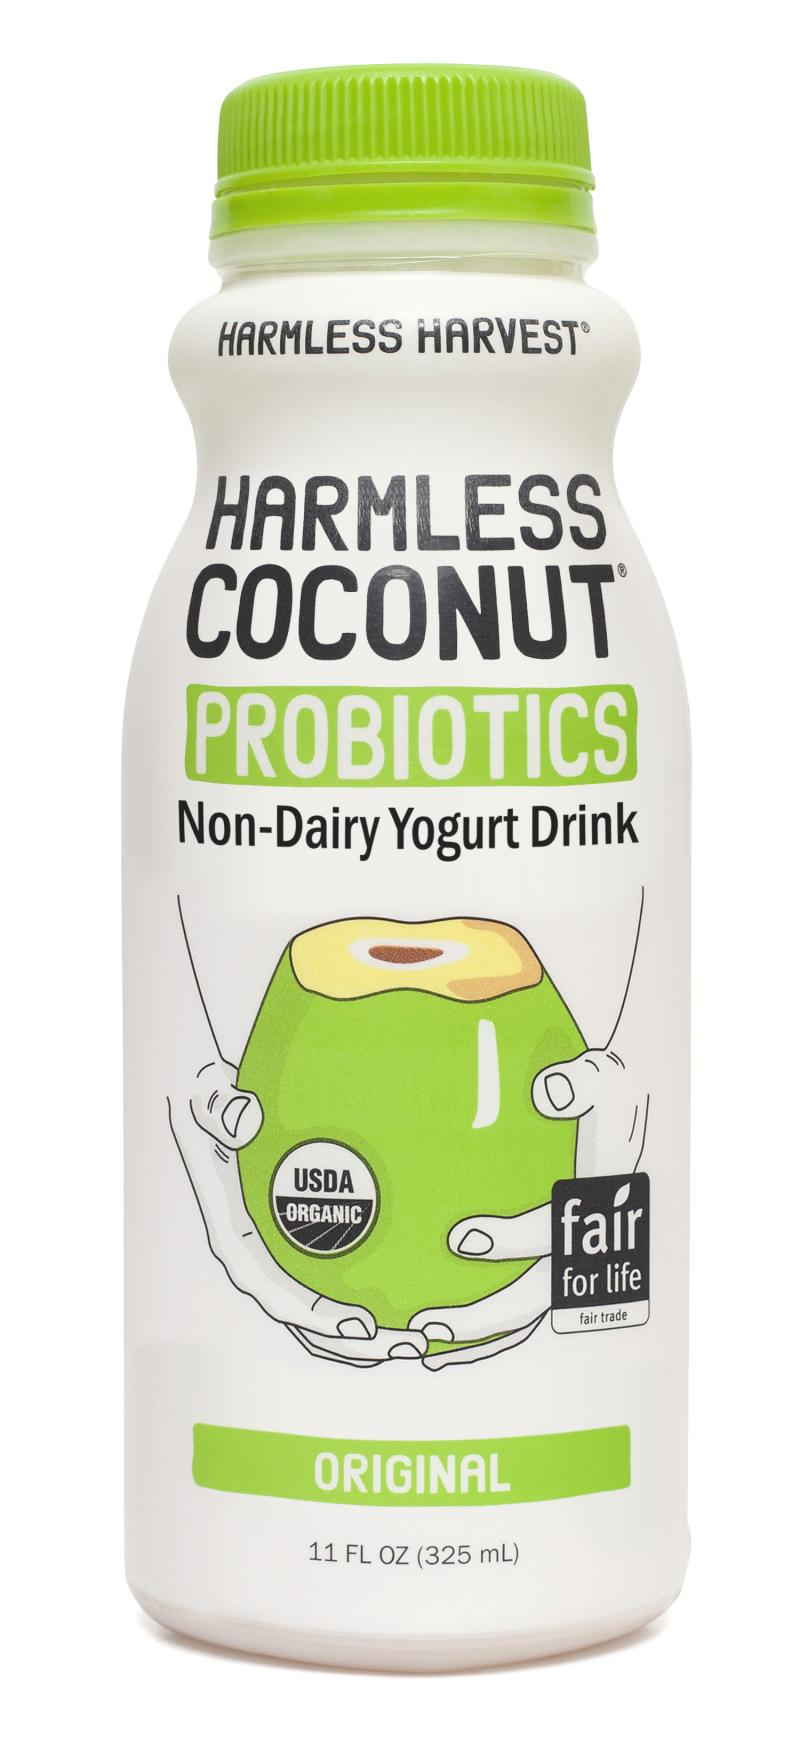 Harmless Coconut Yogurt Drink